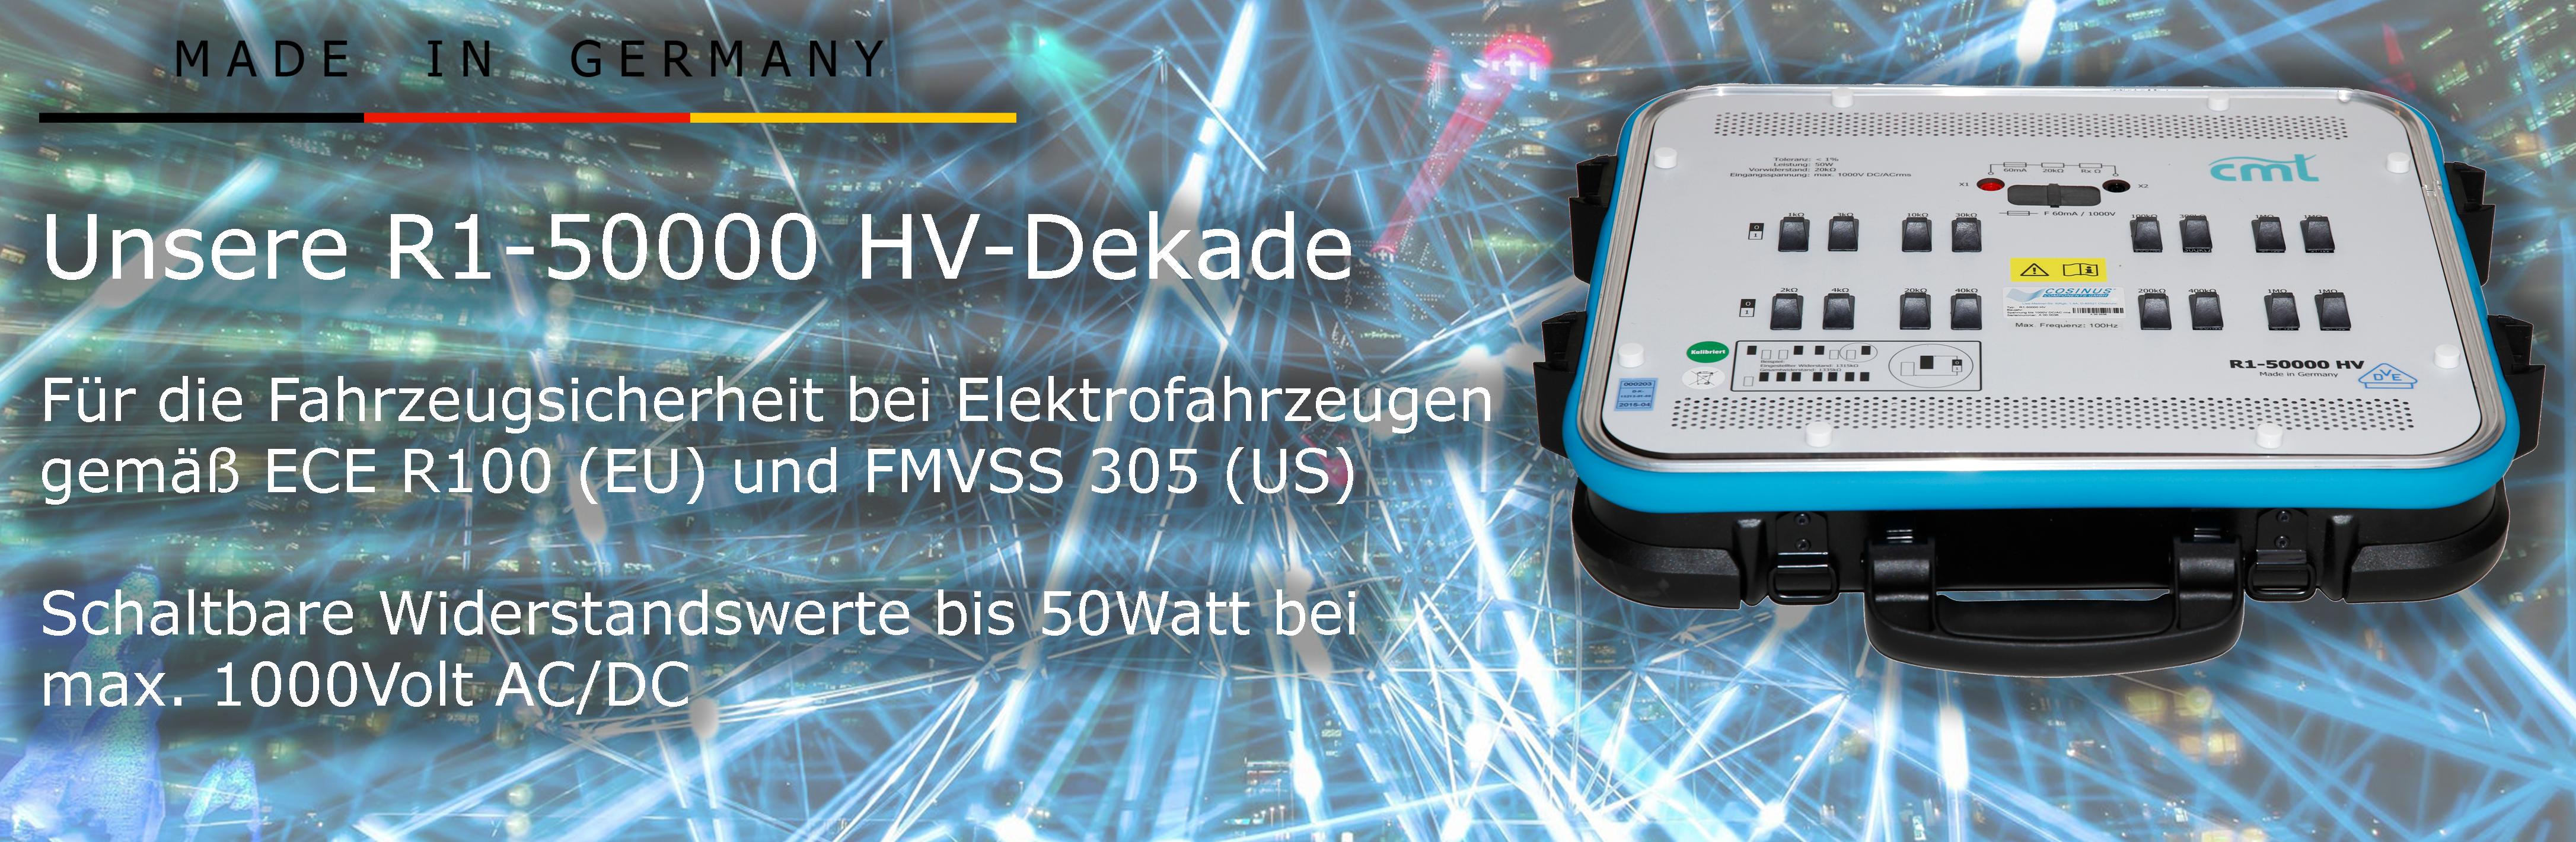 Cosinus: R1 - 50000 HV Dekade 1000 Volt / 50 Watt